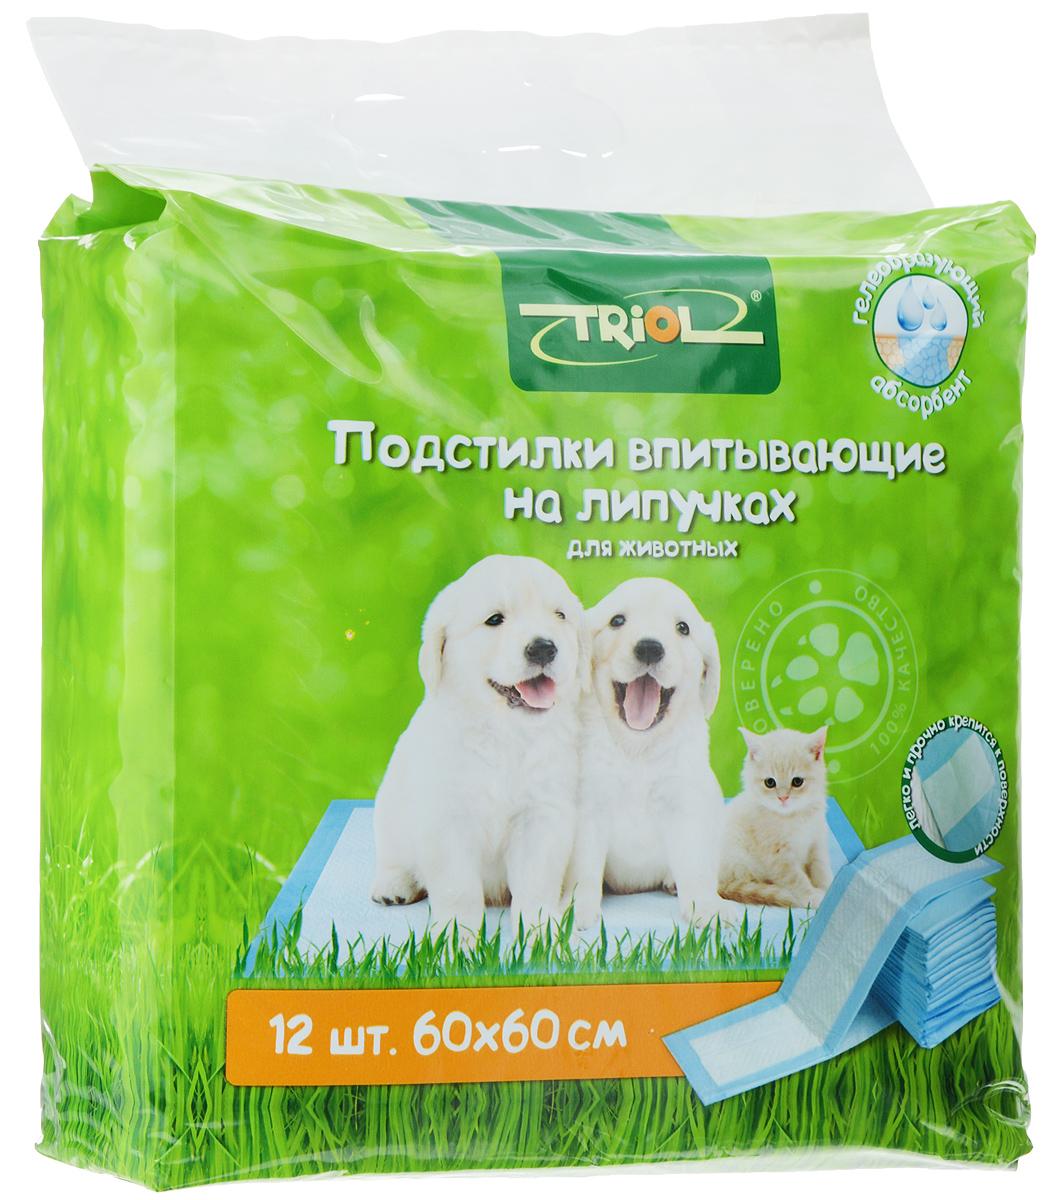 Подстилки для домашних животных Triol, впитывающие, на липучках, 60 х 60 см, 12 шт корм для животных triol песок минеральная подкормка для птиц